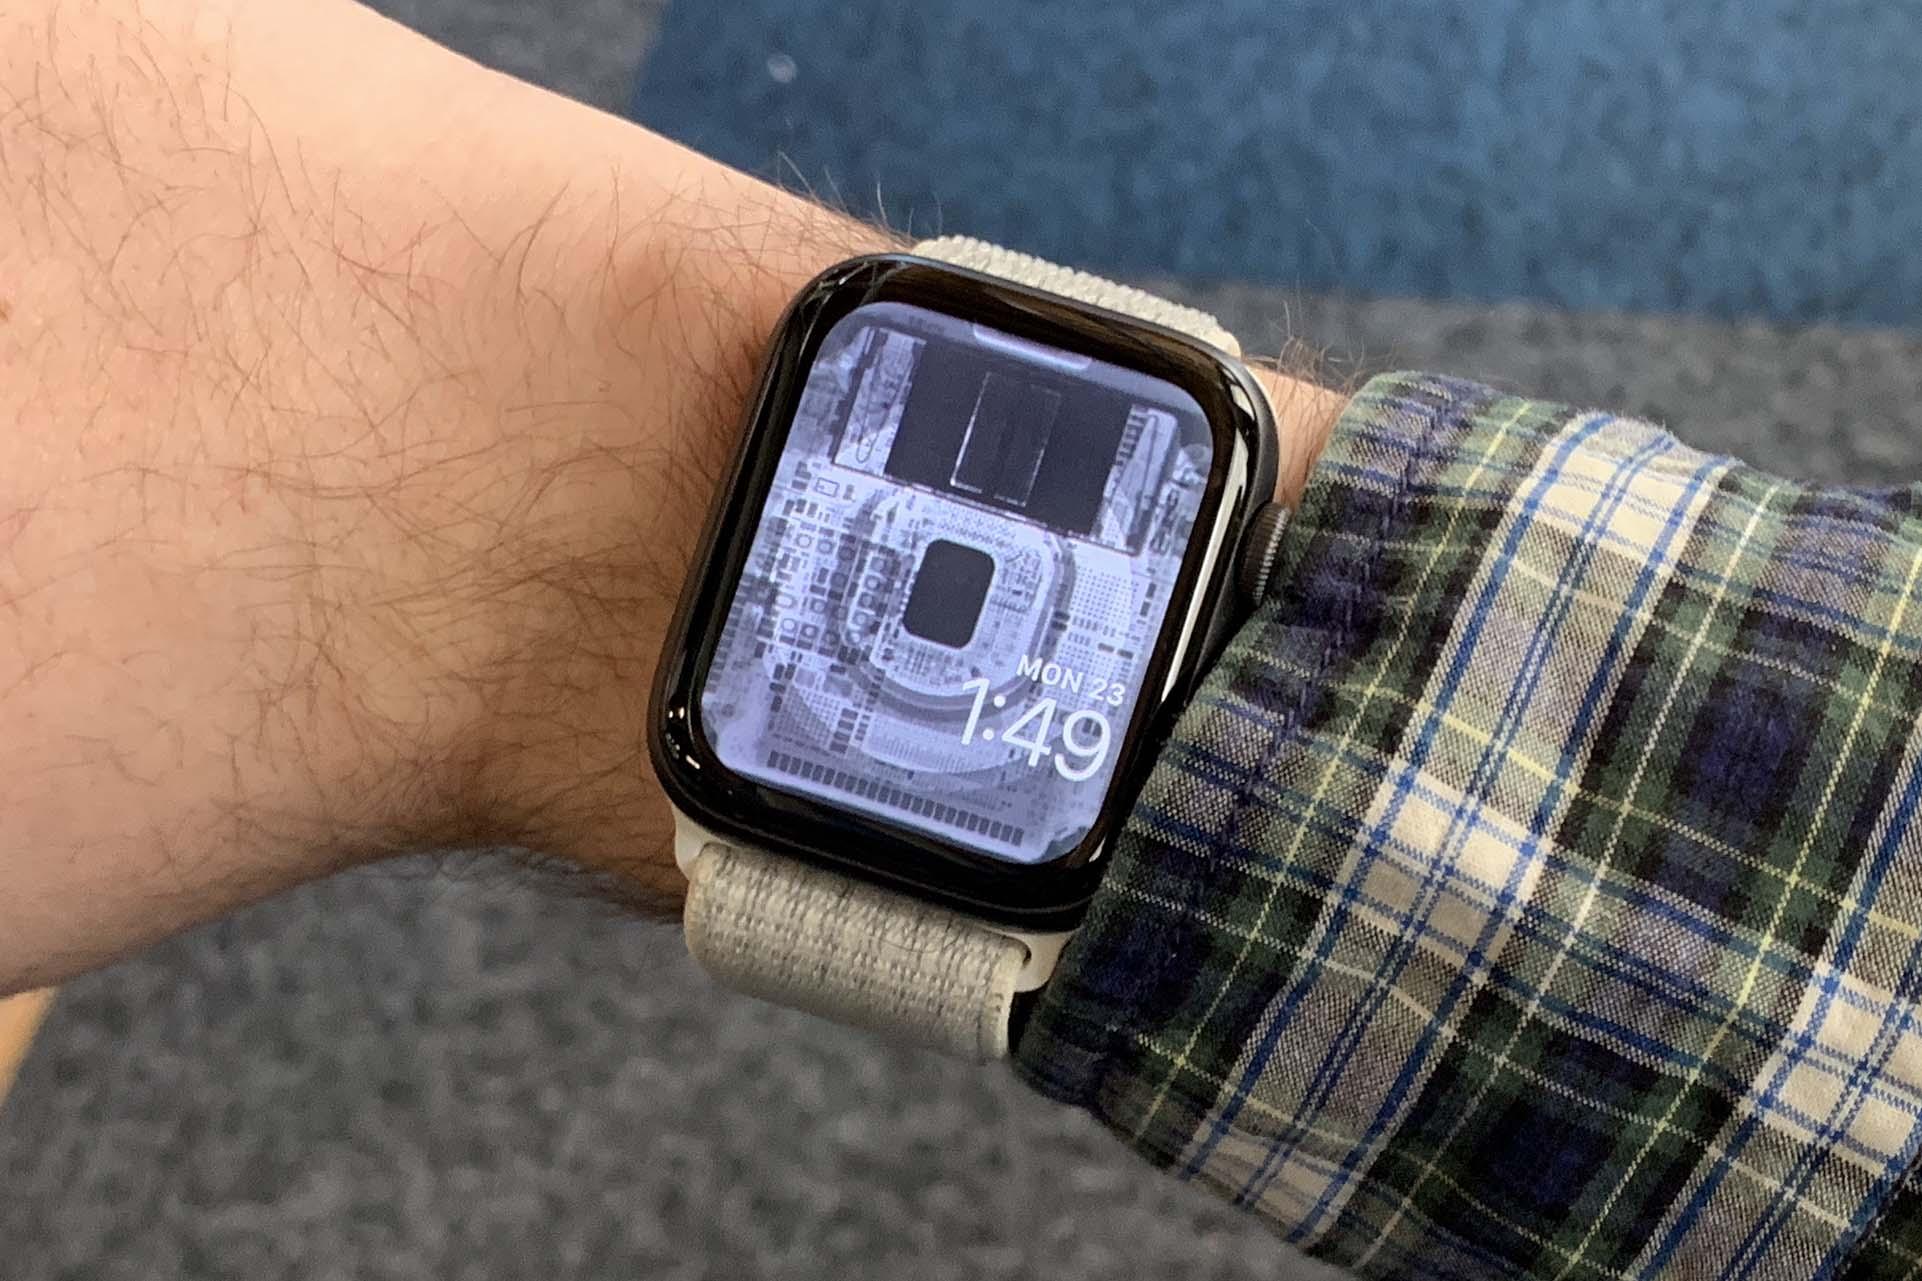 Wallpaper dos componentes internos do Apple Watch Series 5, via iFixit